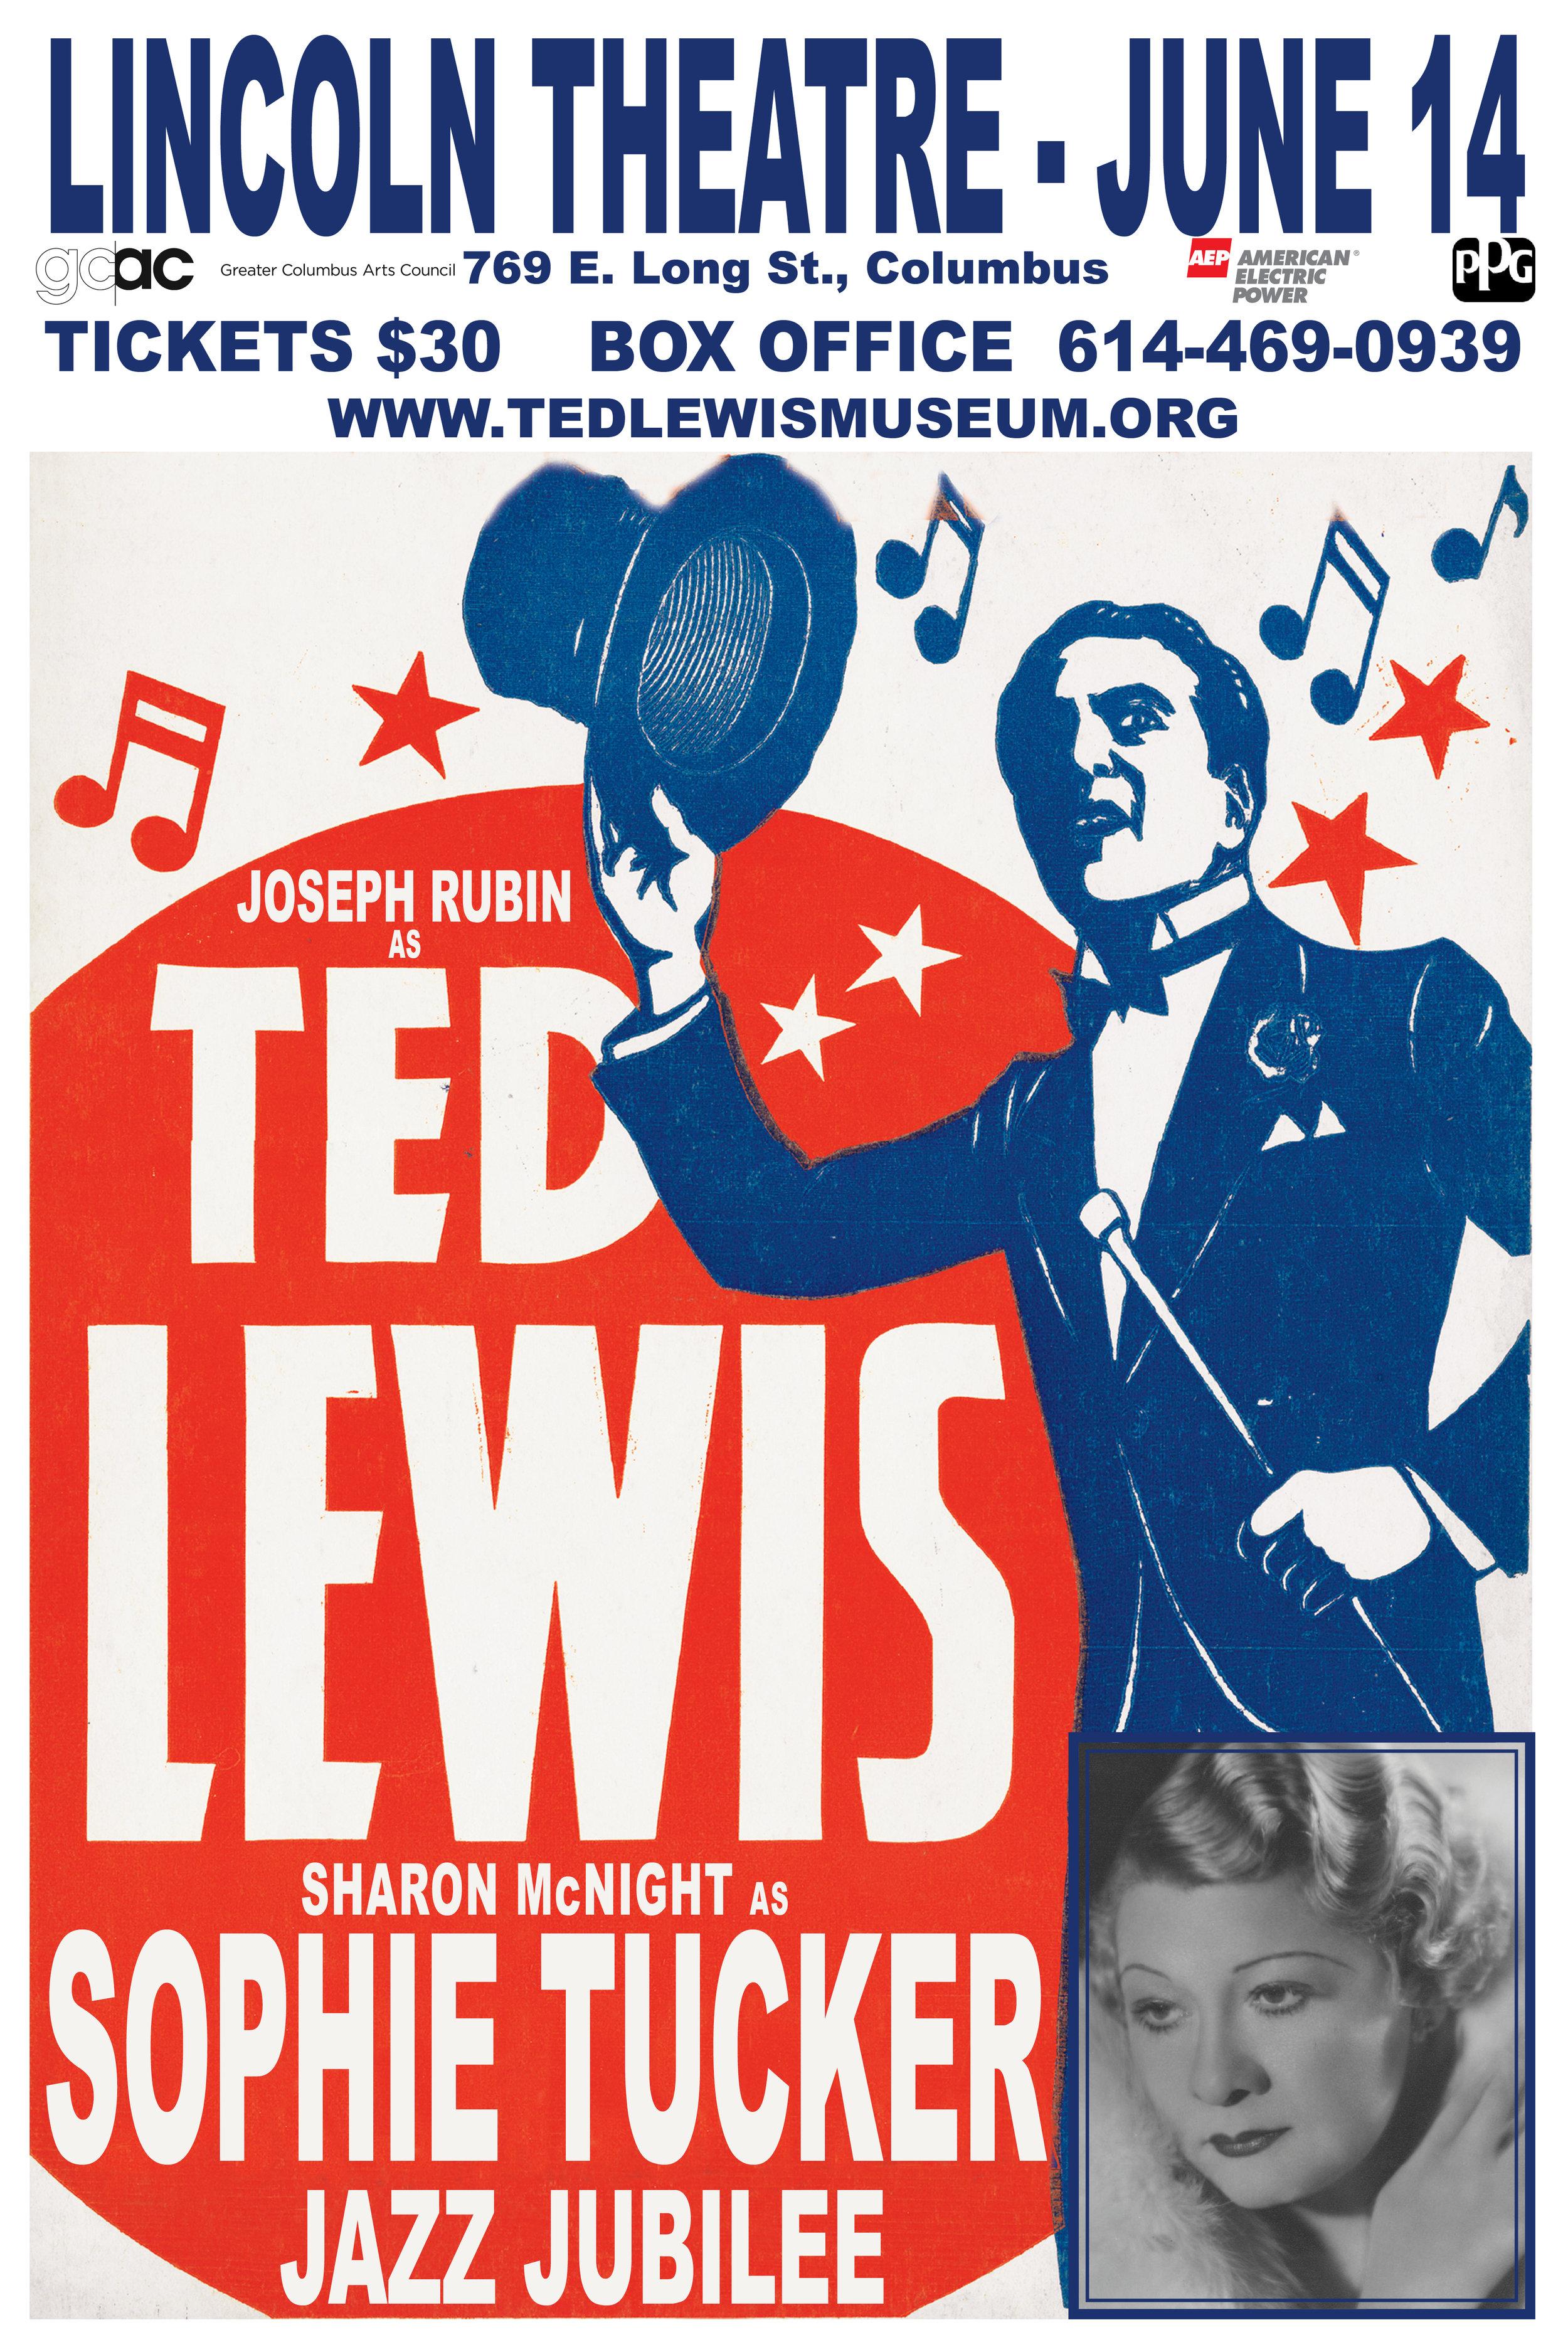 Ted Lewis Columbus Poster 2015.jpg